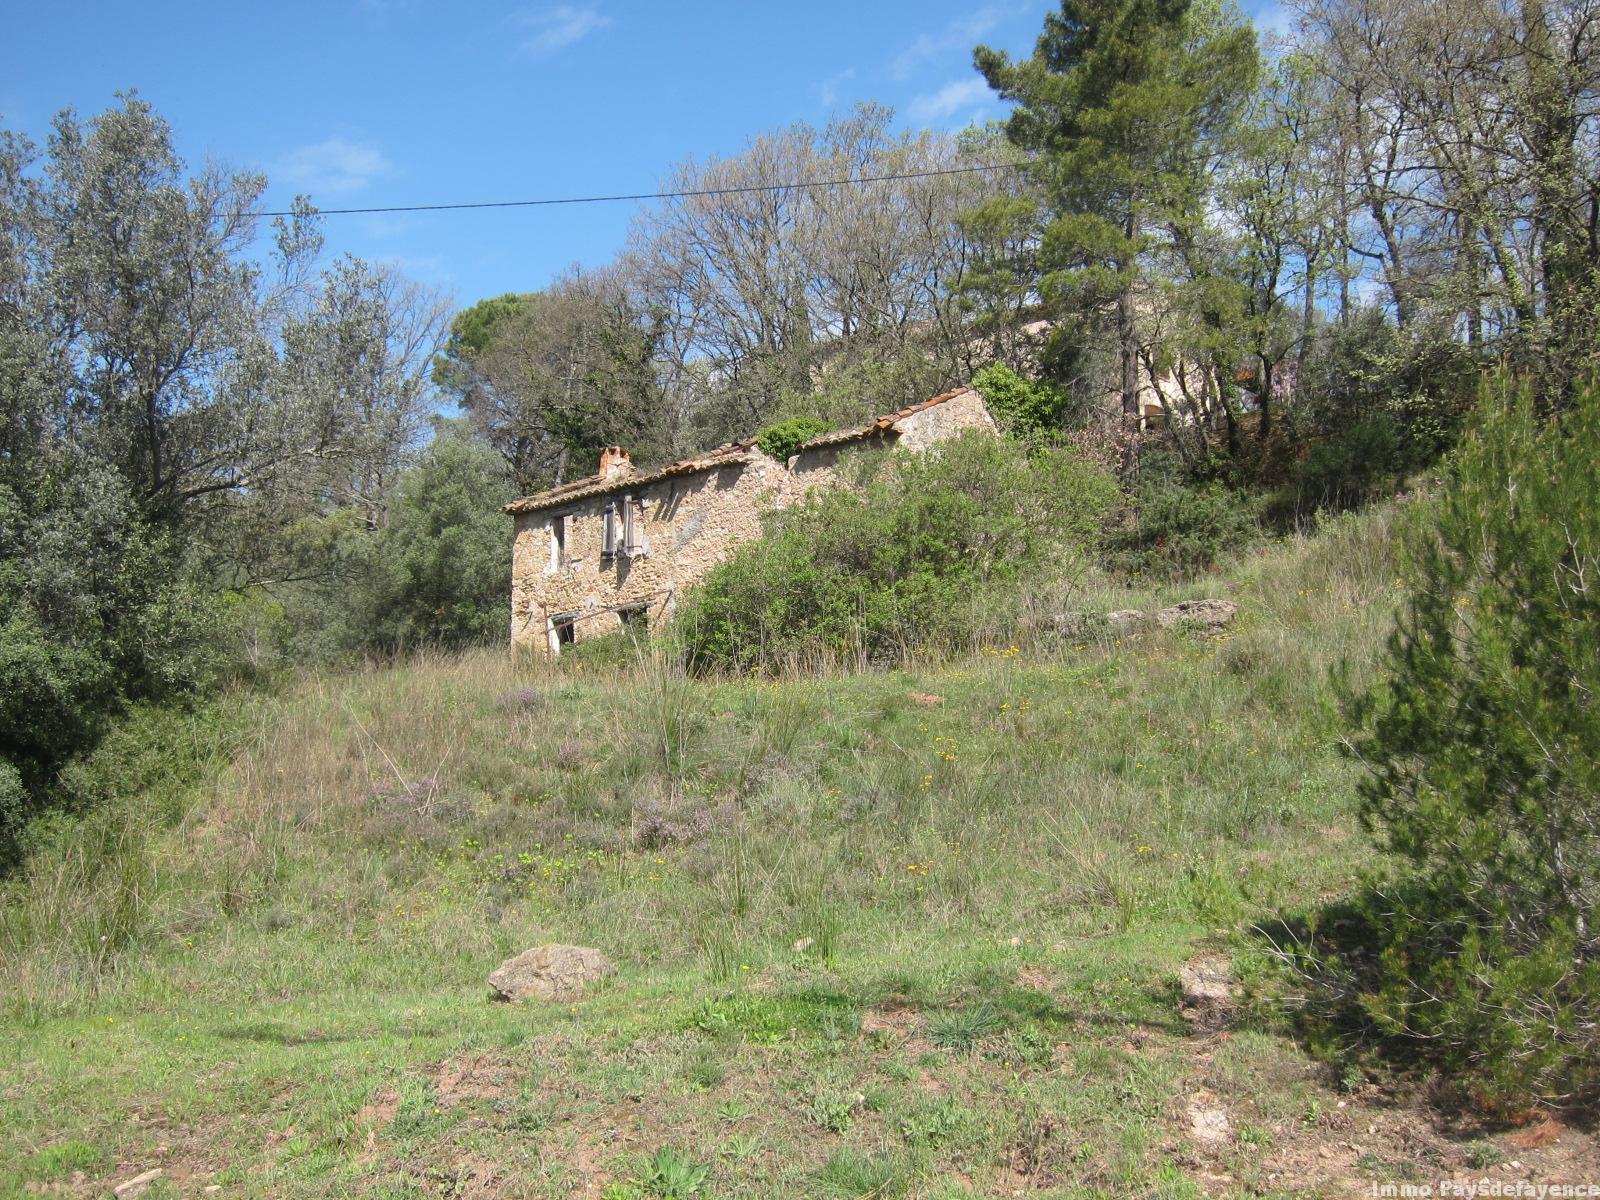 Terrain à bâtir Pays de Fayence 1600 m² avec bastide en pierre